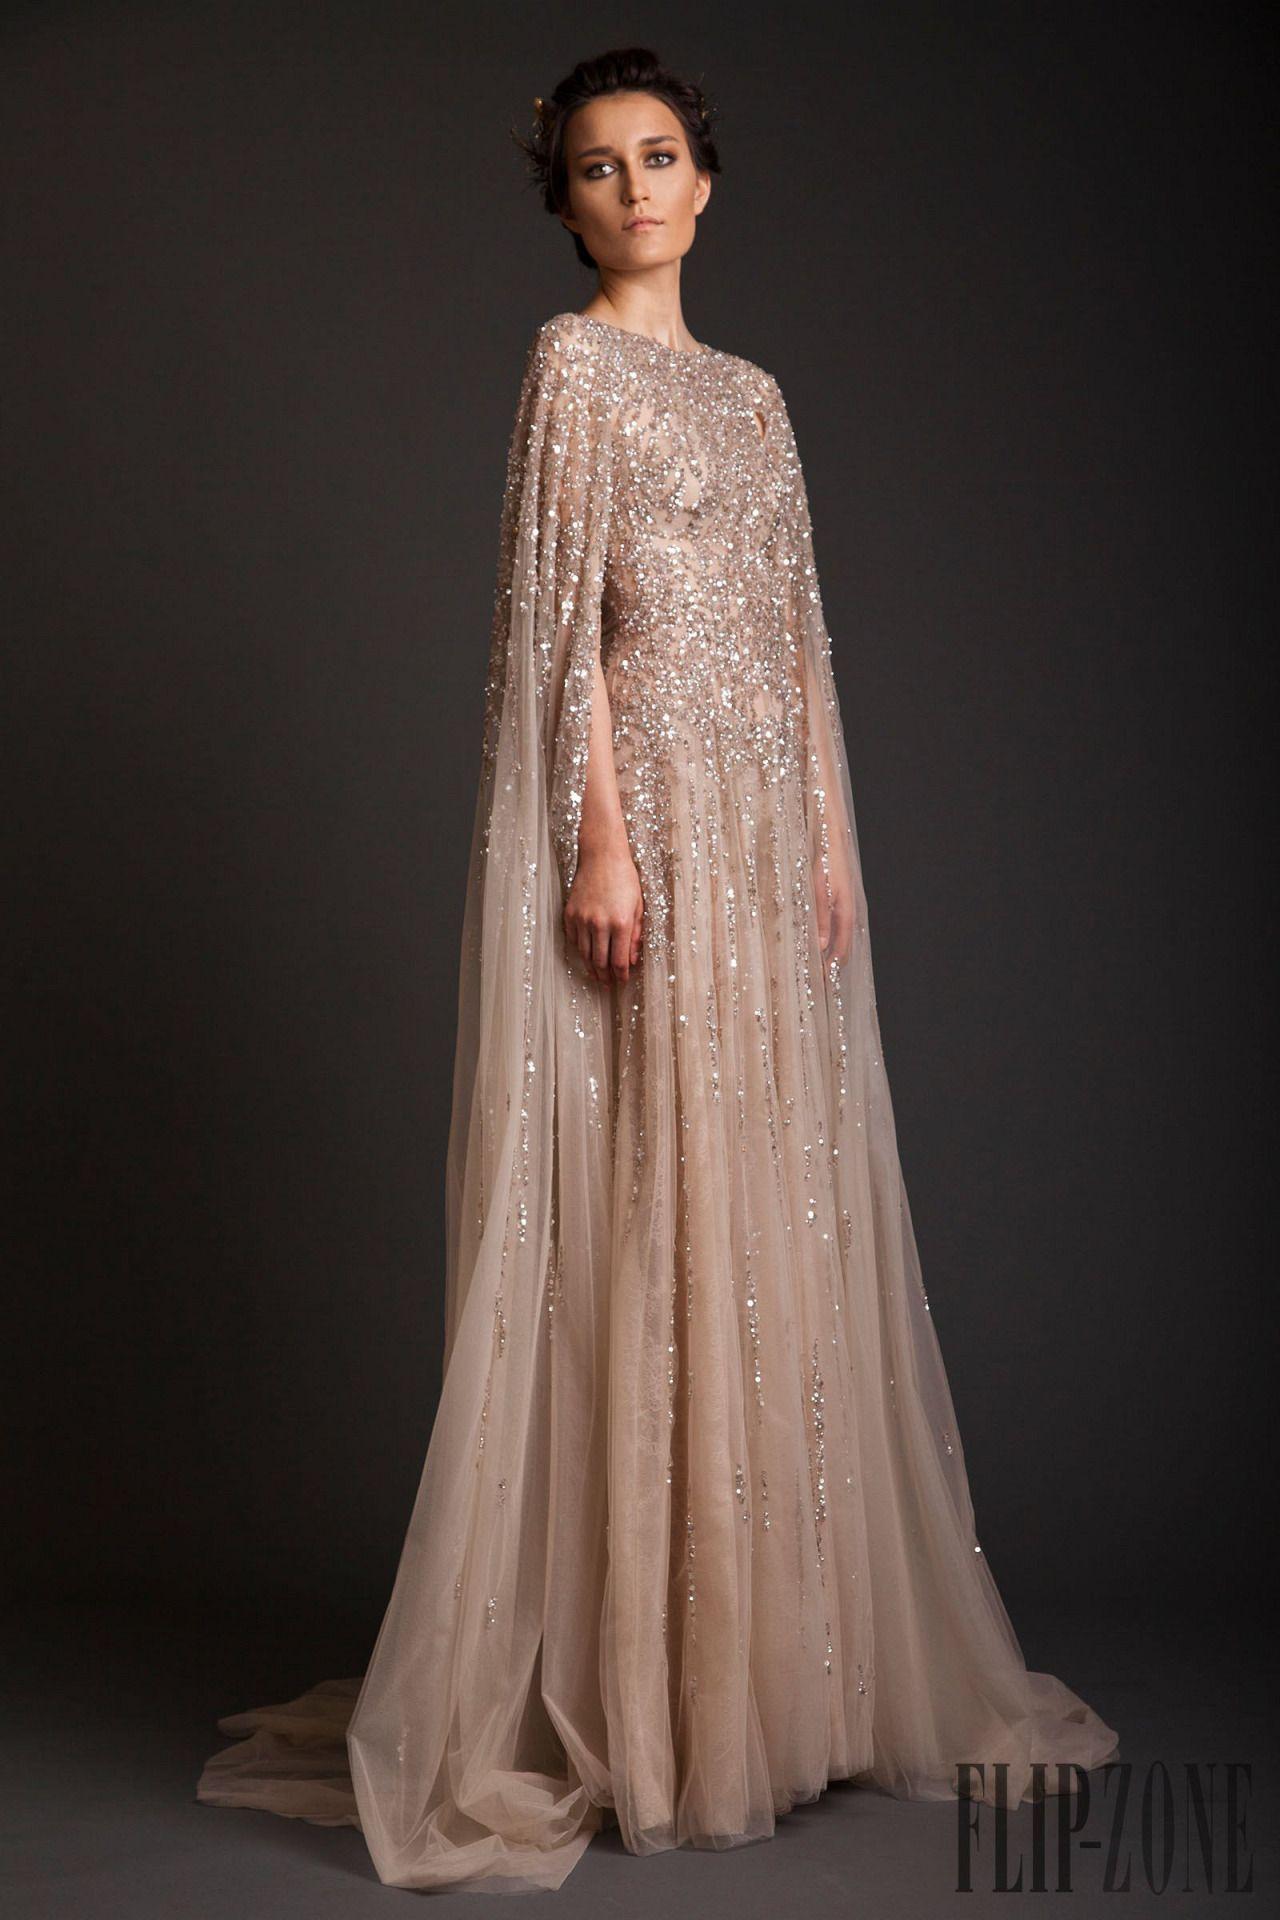 Style of Westeros - Daenerys Targaryen - Krikor Jabotian Haute Couture...